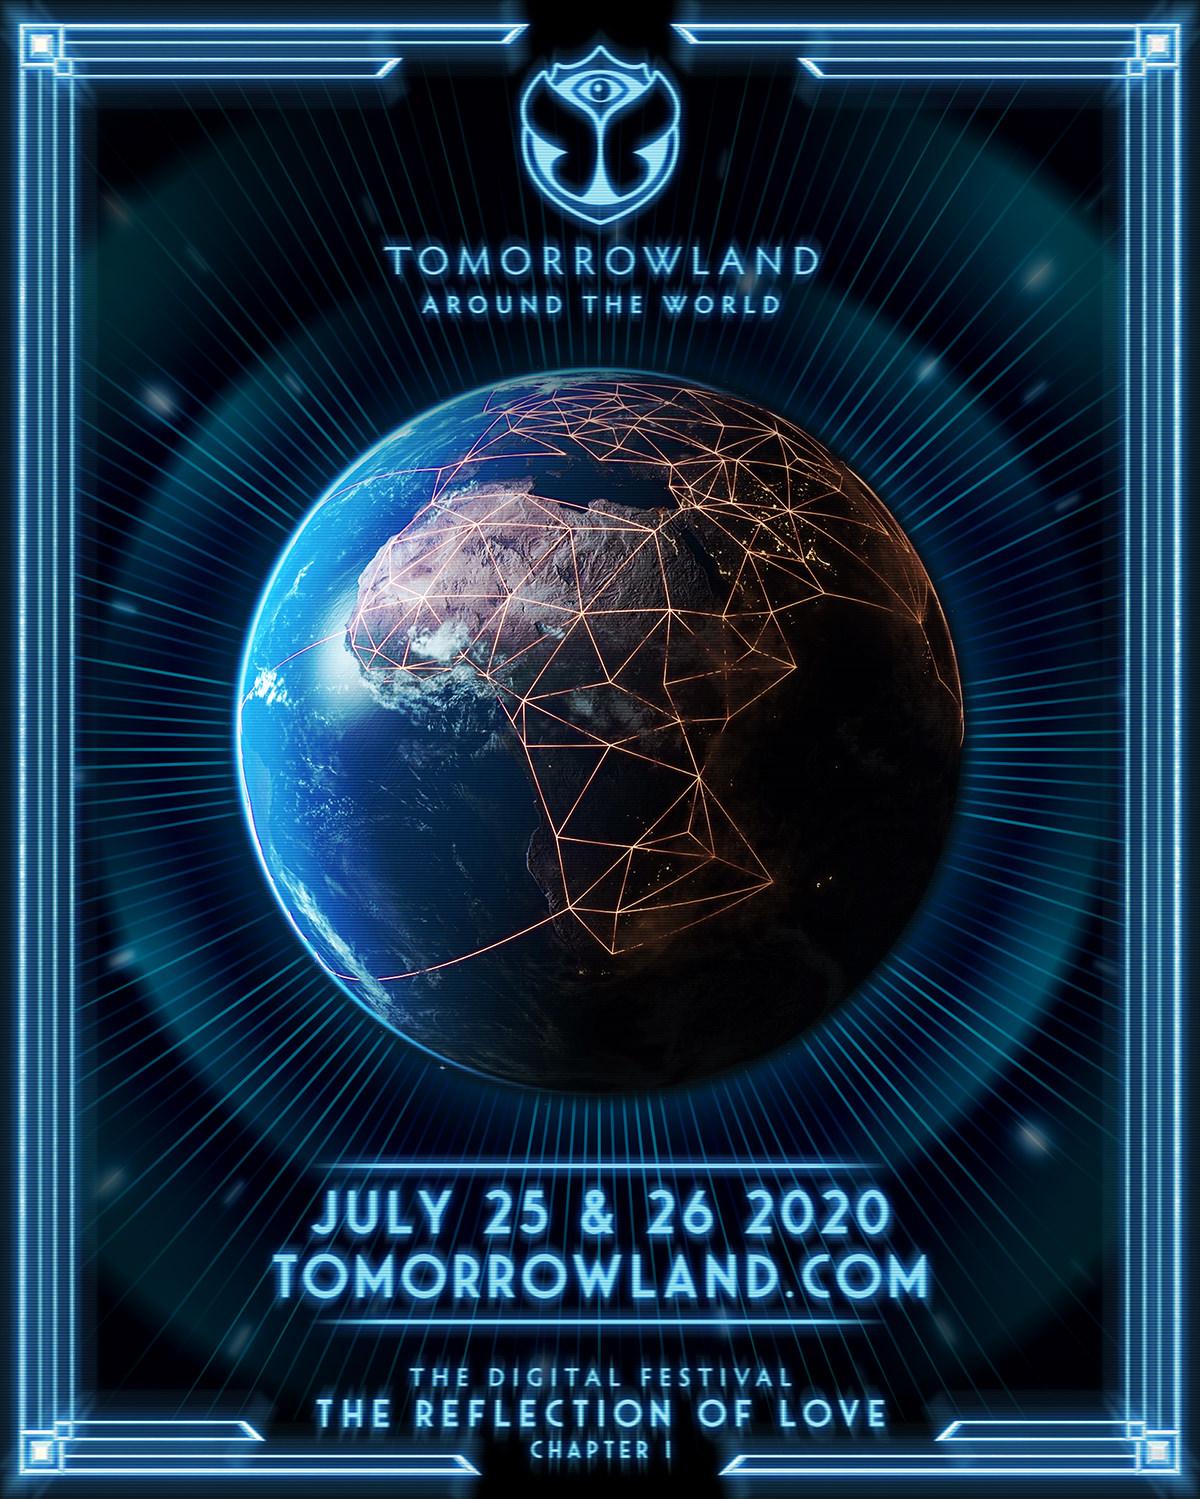 Tomorrowland Around The World 2020